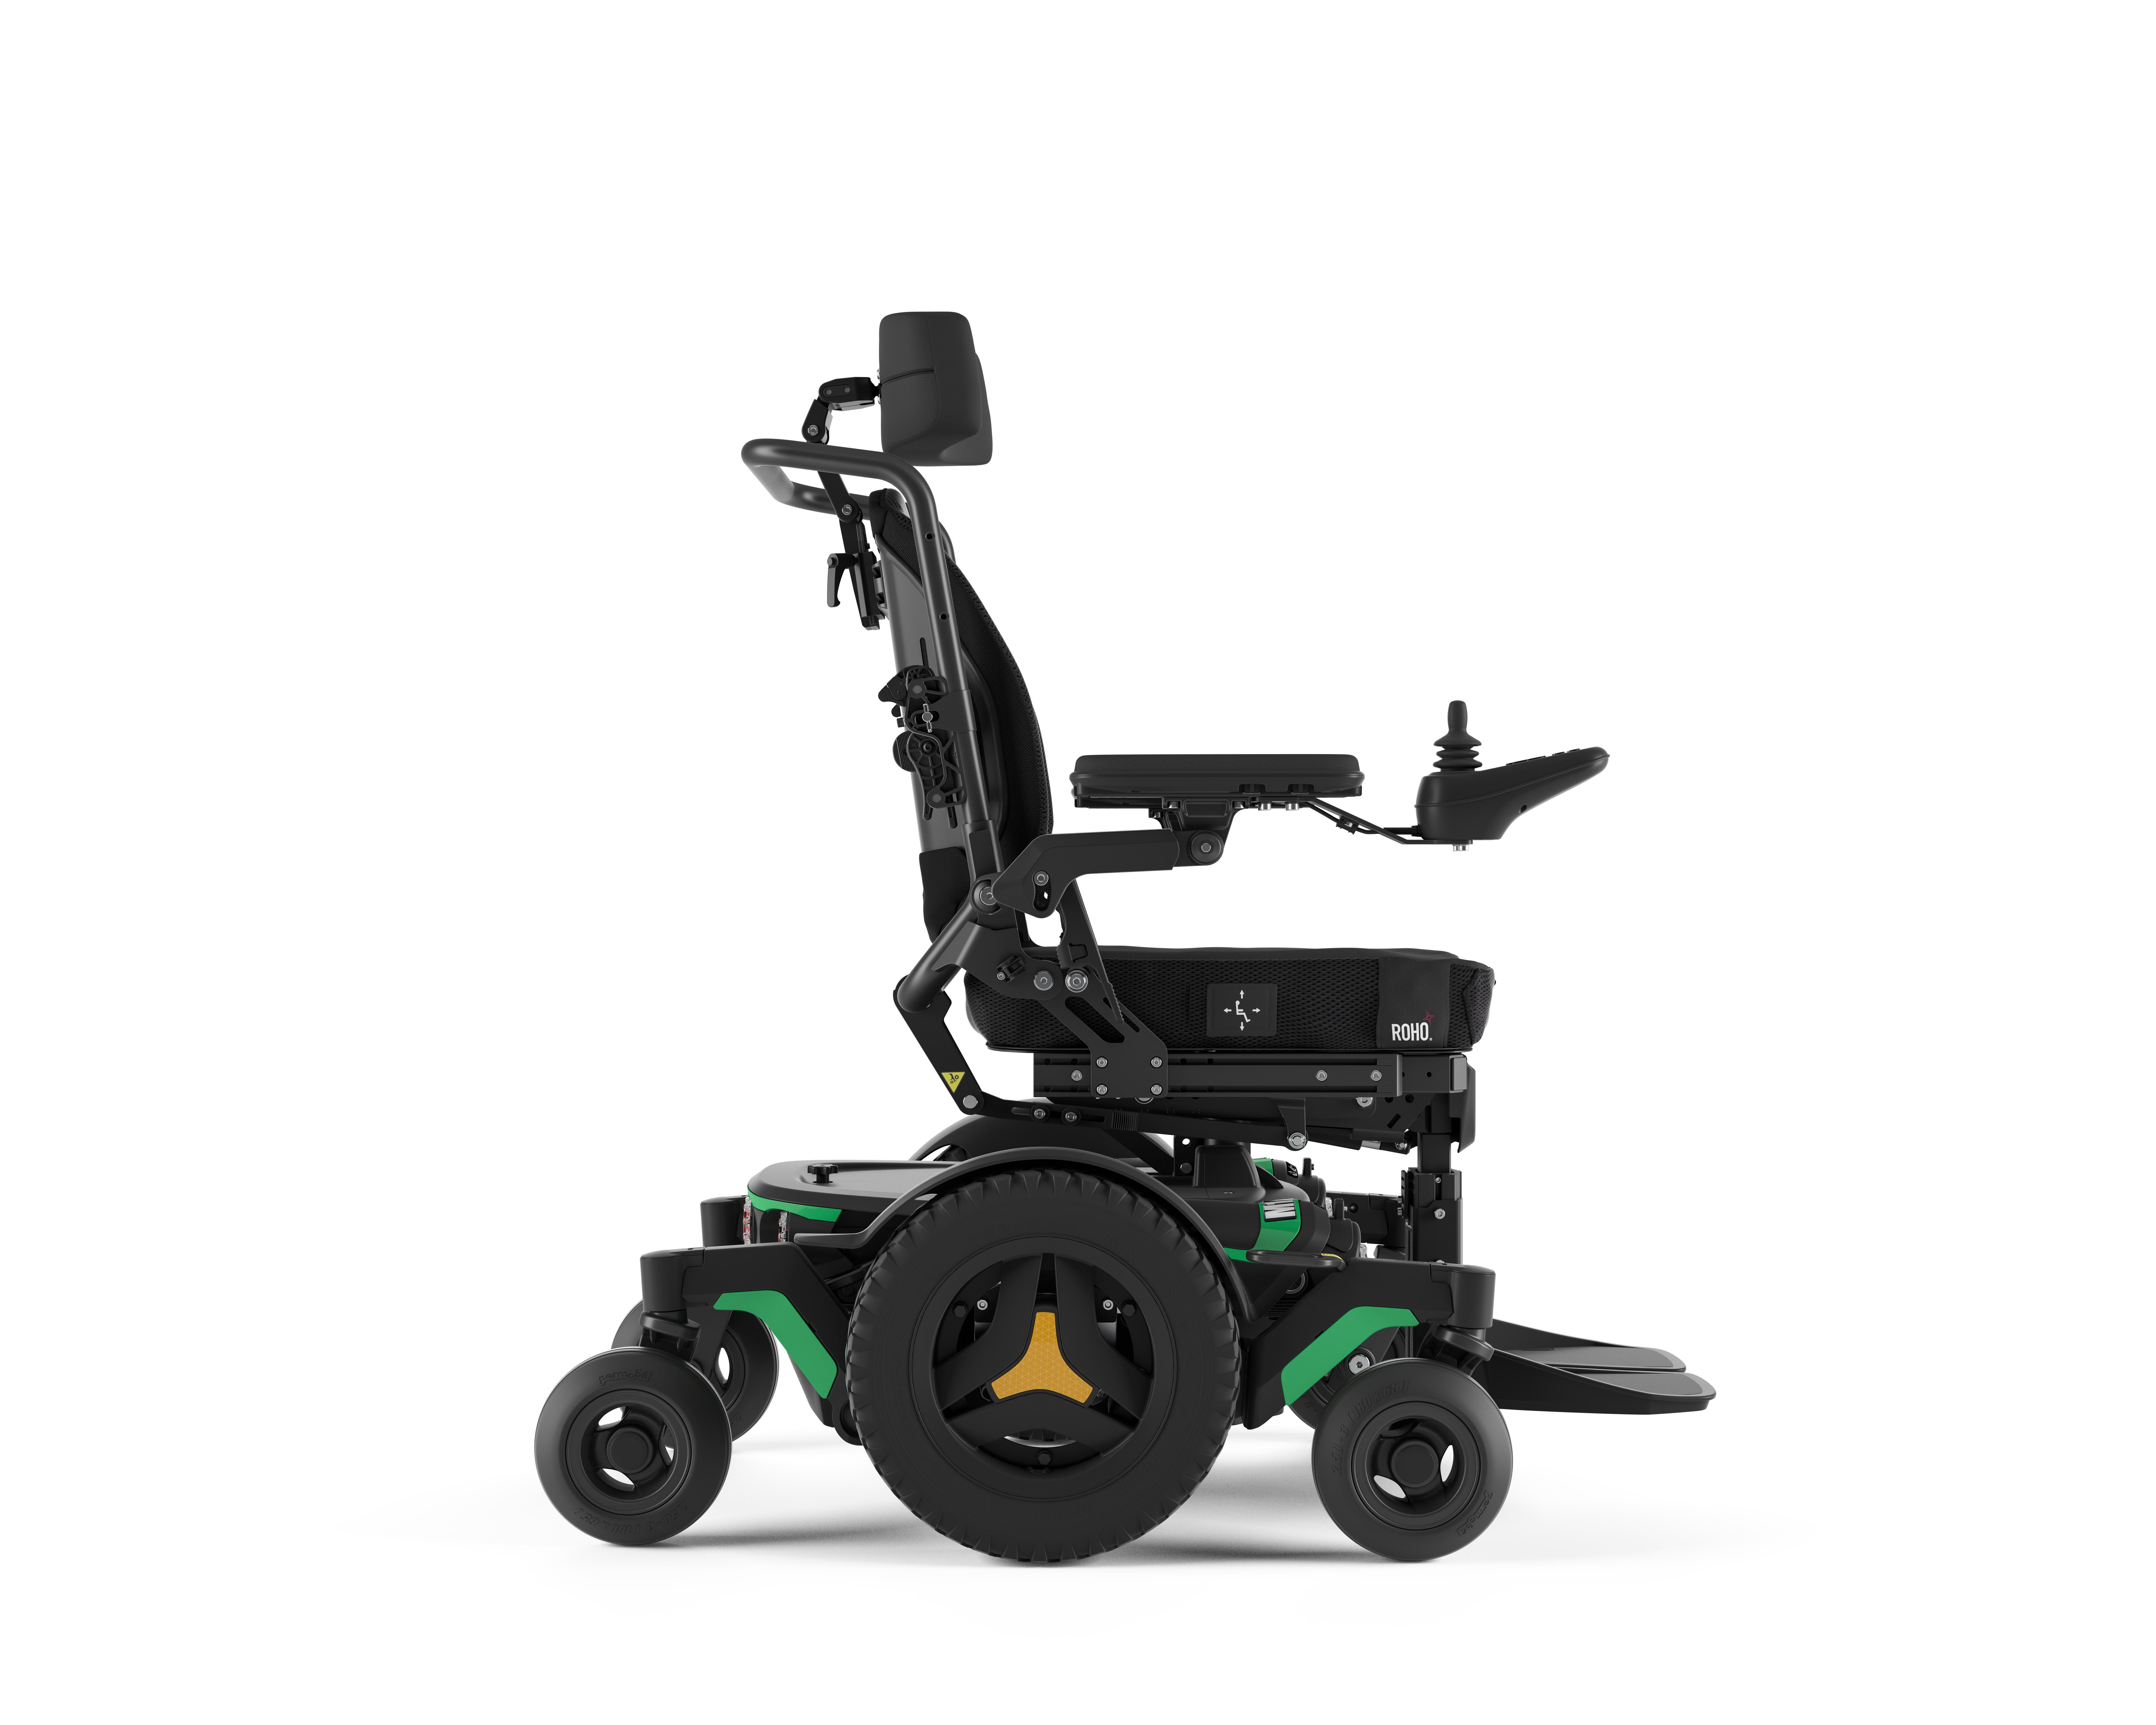 Permobil M1 in Green indoor powerchair